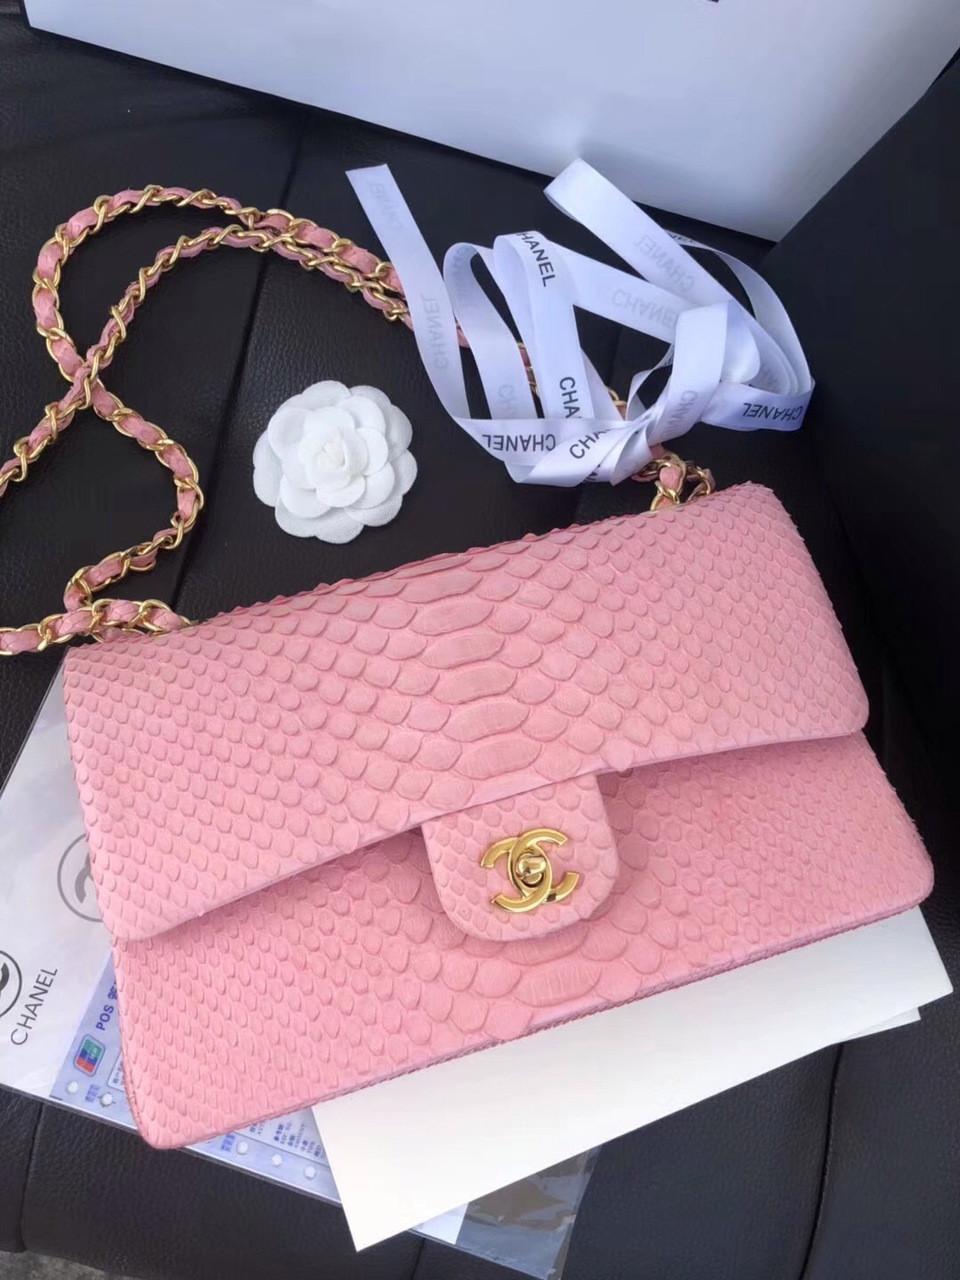 b0430d550a23 Chanel Classic Handbag with Pink Python & Gold Metal - Bella Vita Moda